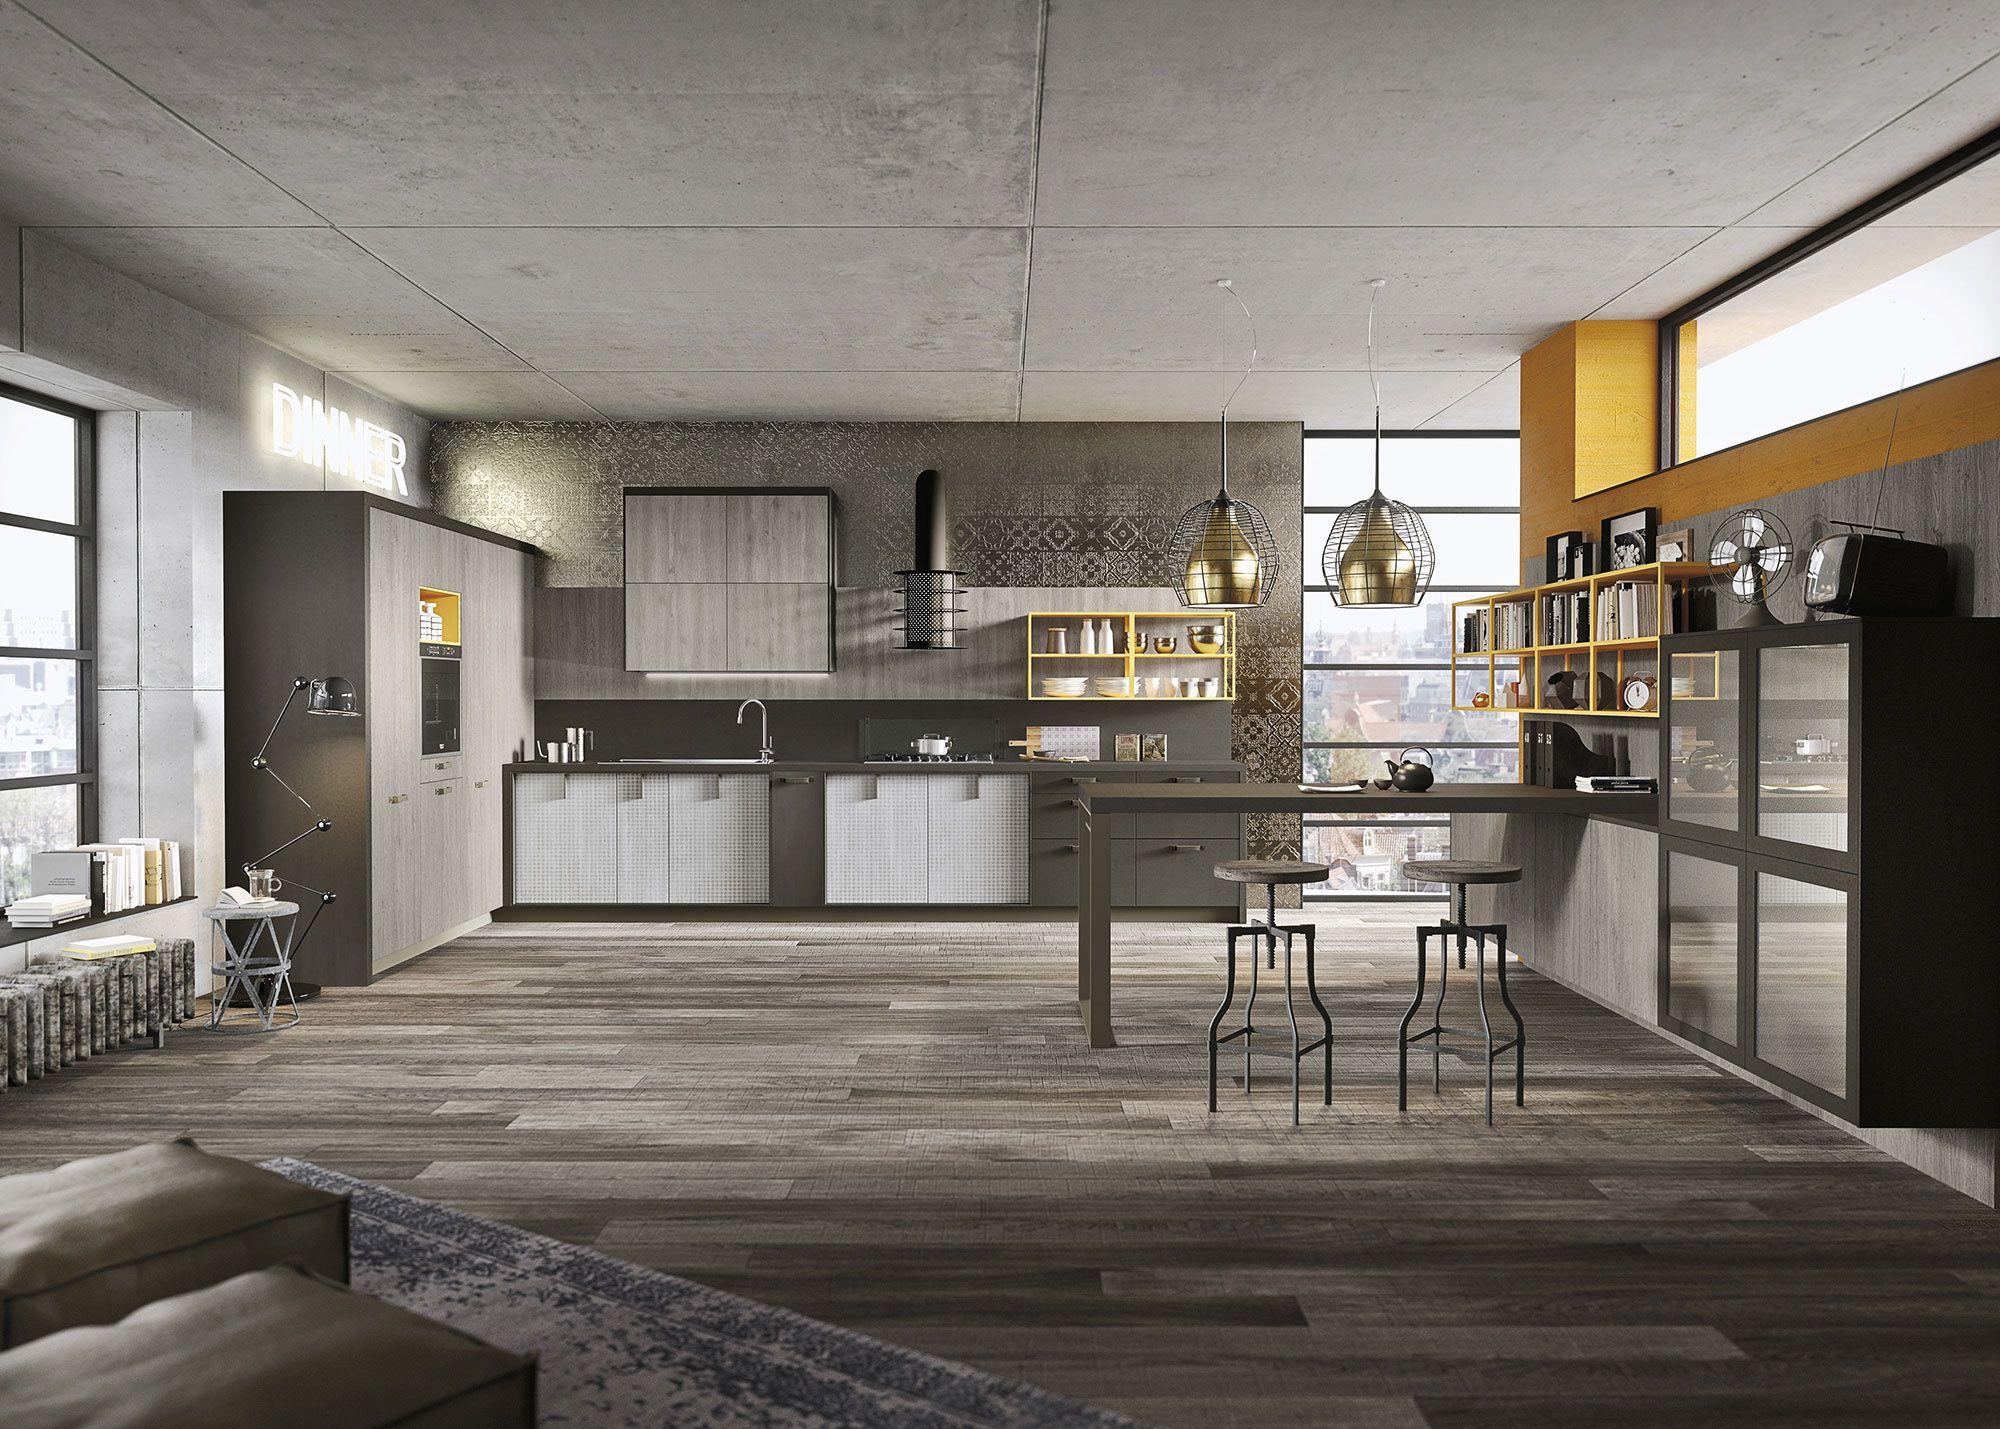 kitchen design for lofts: 3 urban ideas from snaidero   urban loft